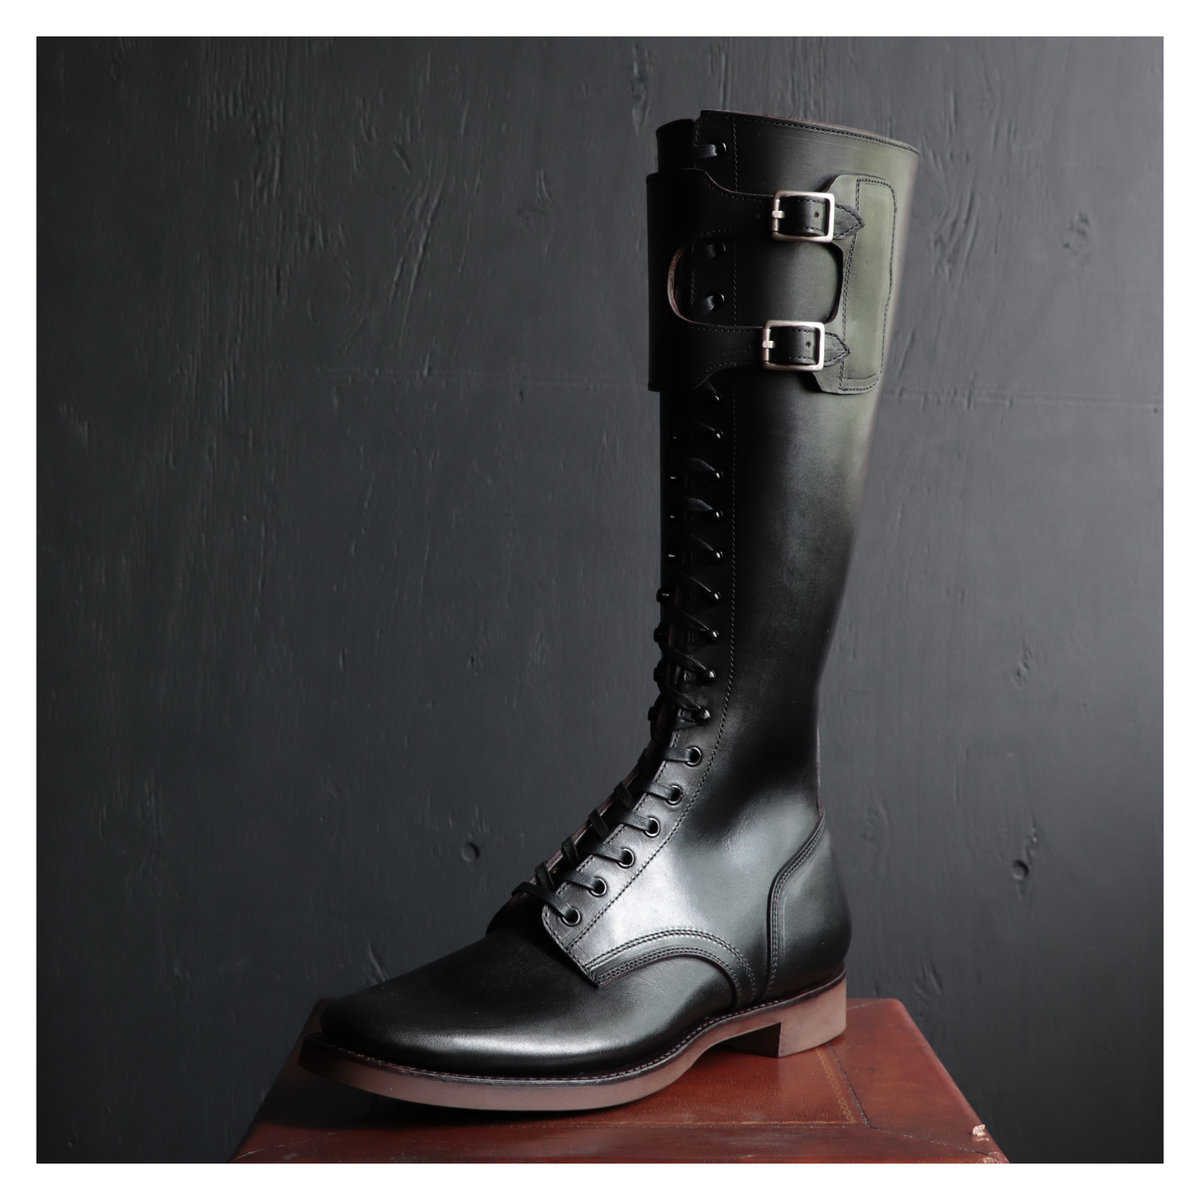 BS x Clinch - Transcontinental Boots - Flat-19.jpg